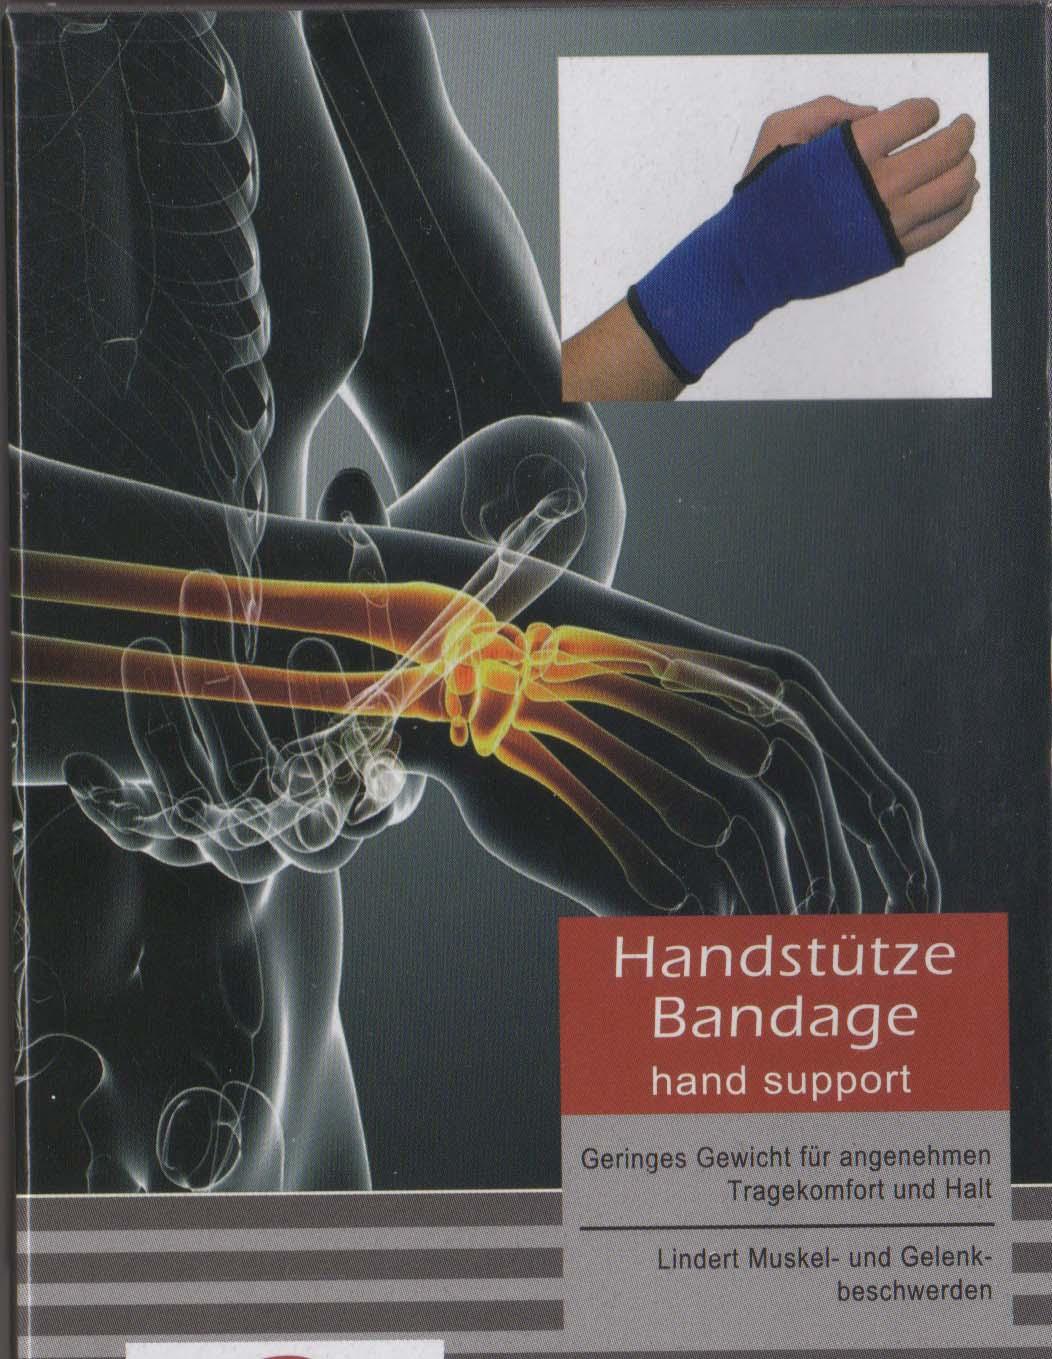 PROFI Handstütze Bandage Hand stützen Handgelenk Muskel lindert ...